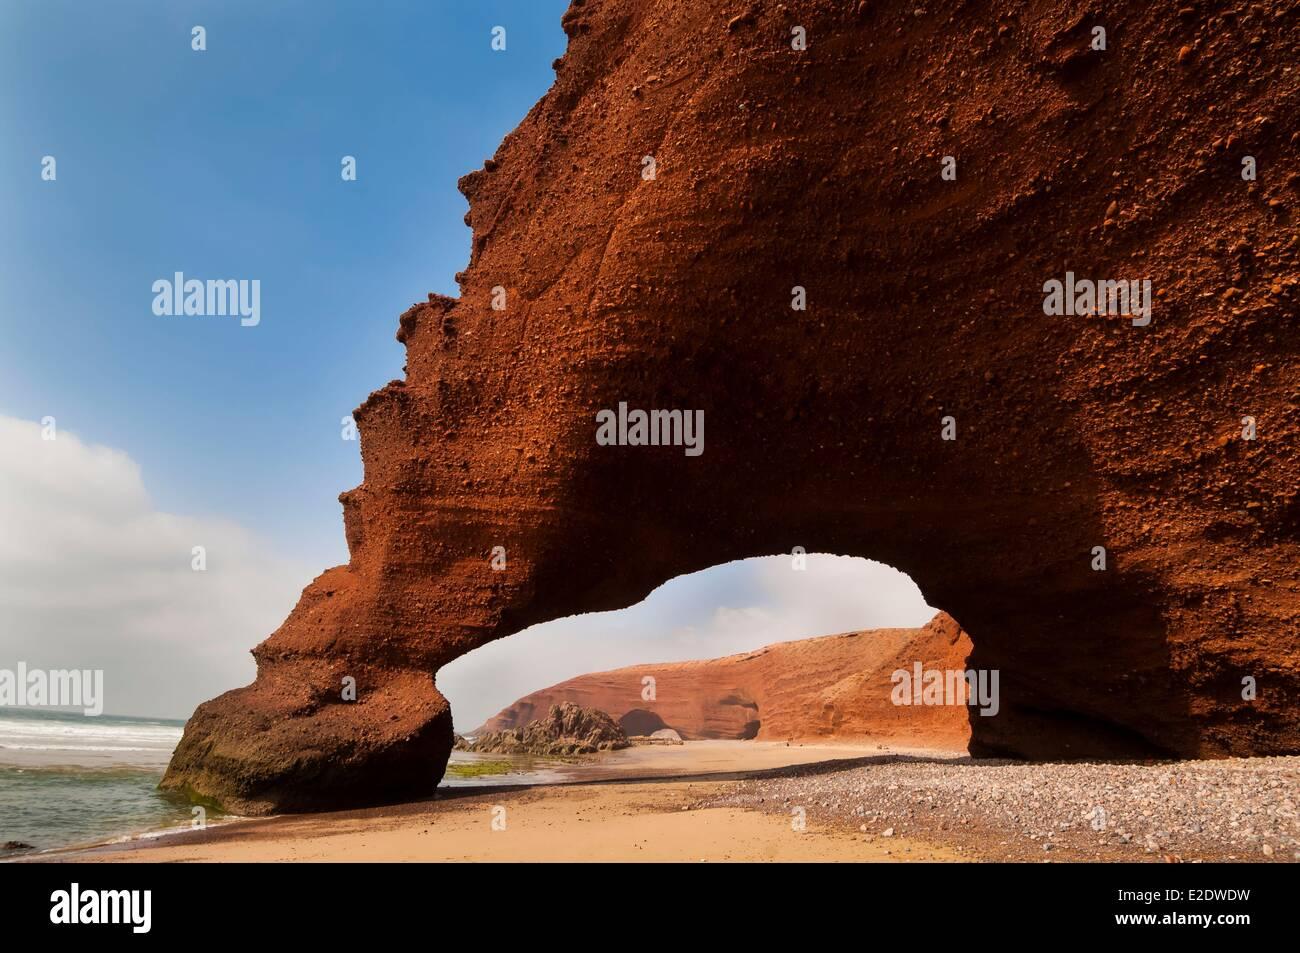 Morocco Souss region Atlantic coast in the South of Agadir Mirleft the red cliffs of el Djazirah - Stock Image